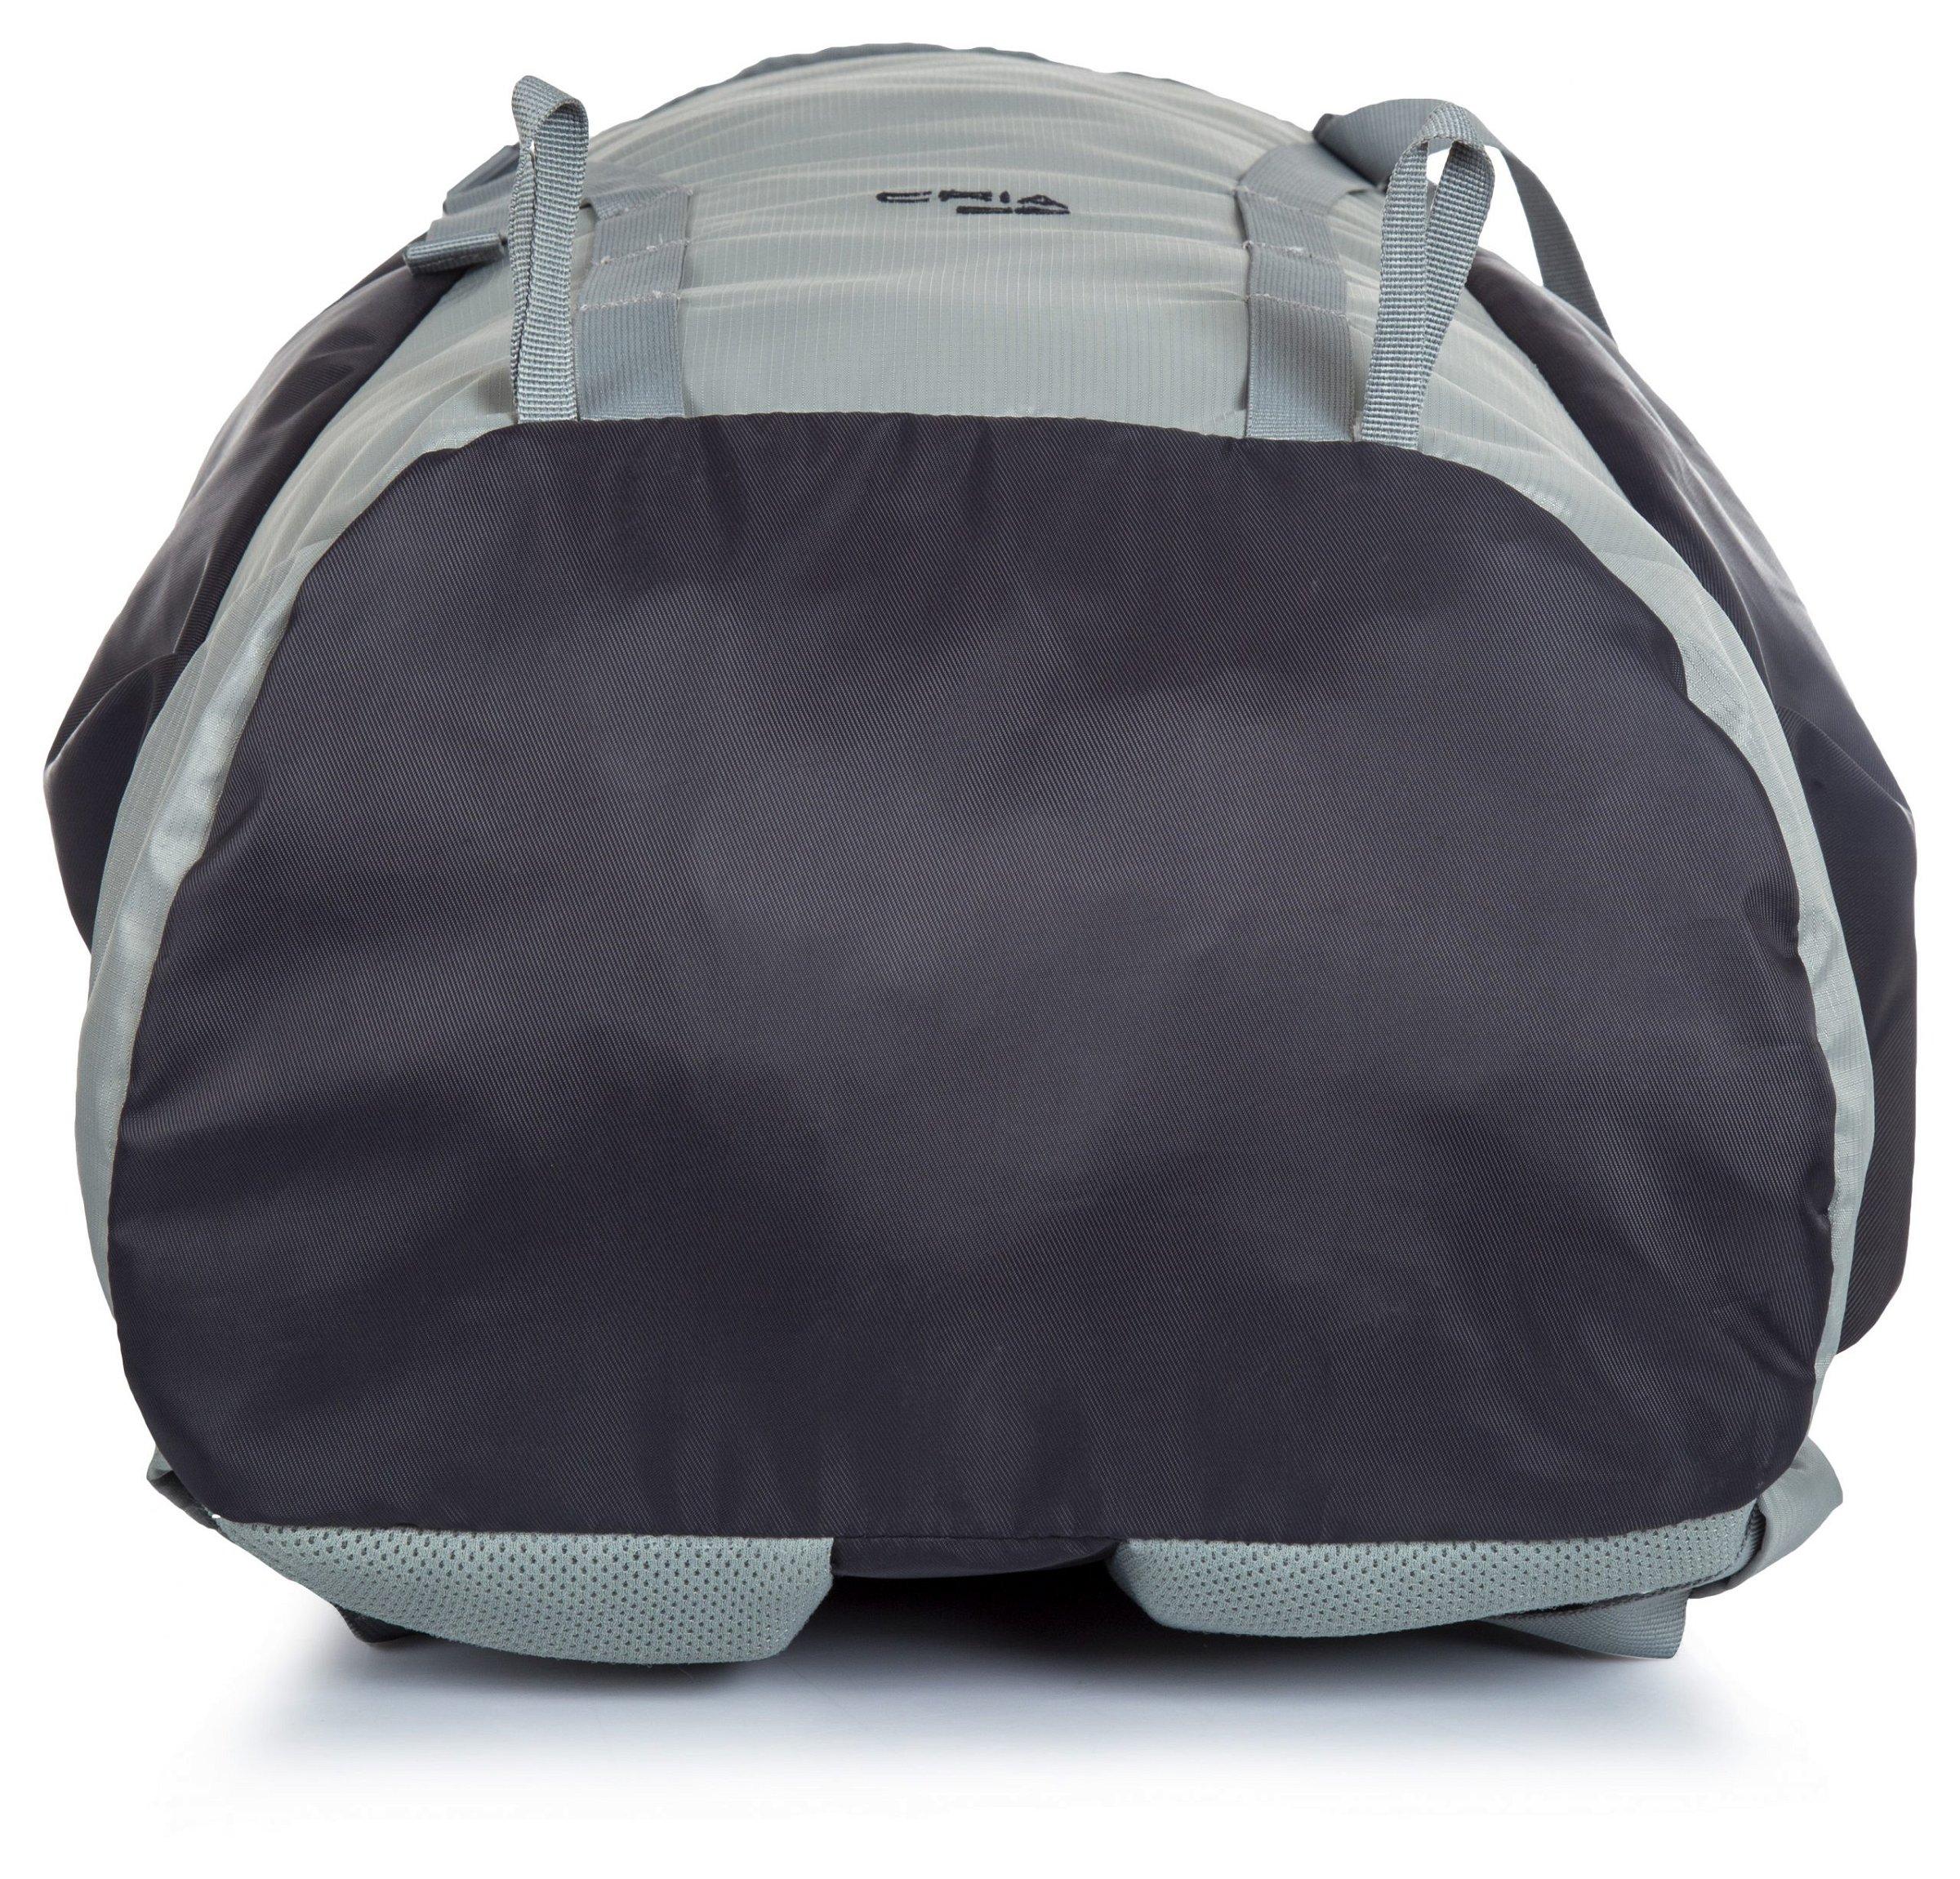 Greenlands Cria 55 Hikking Bag